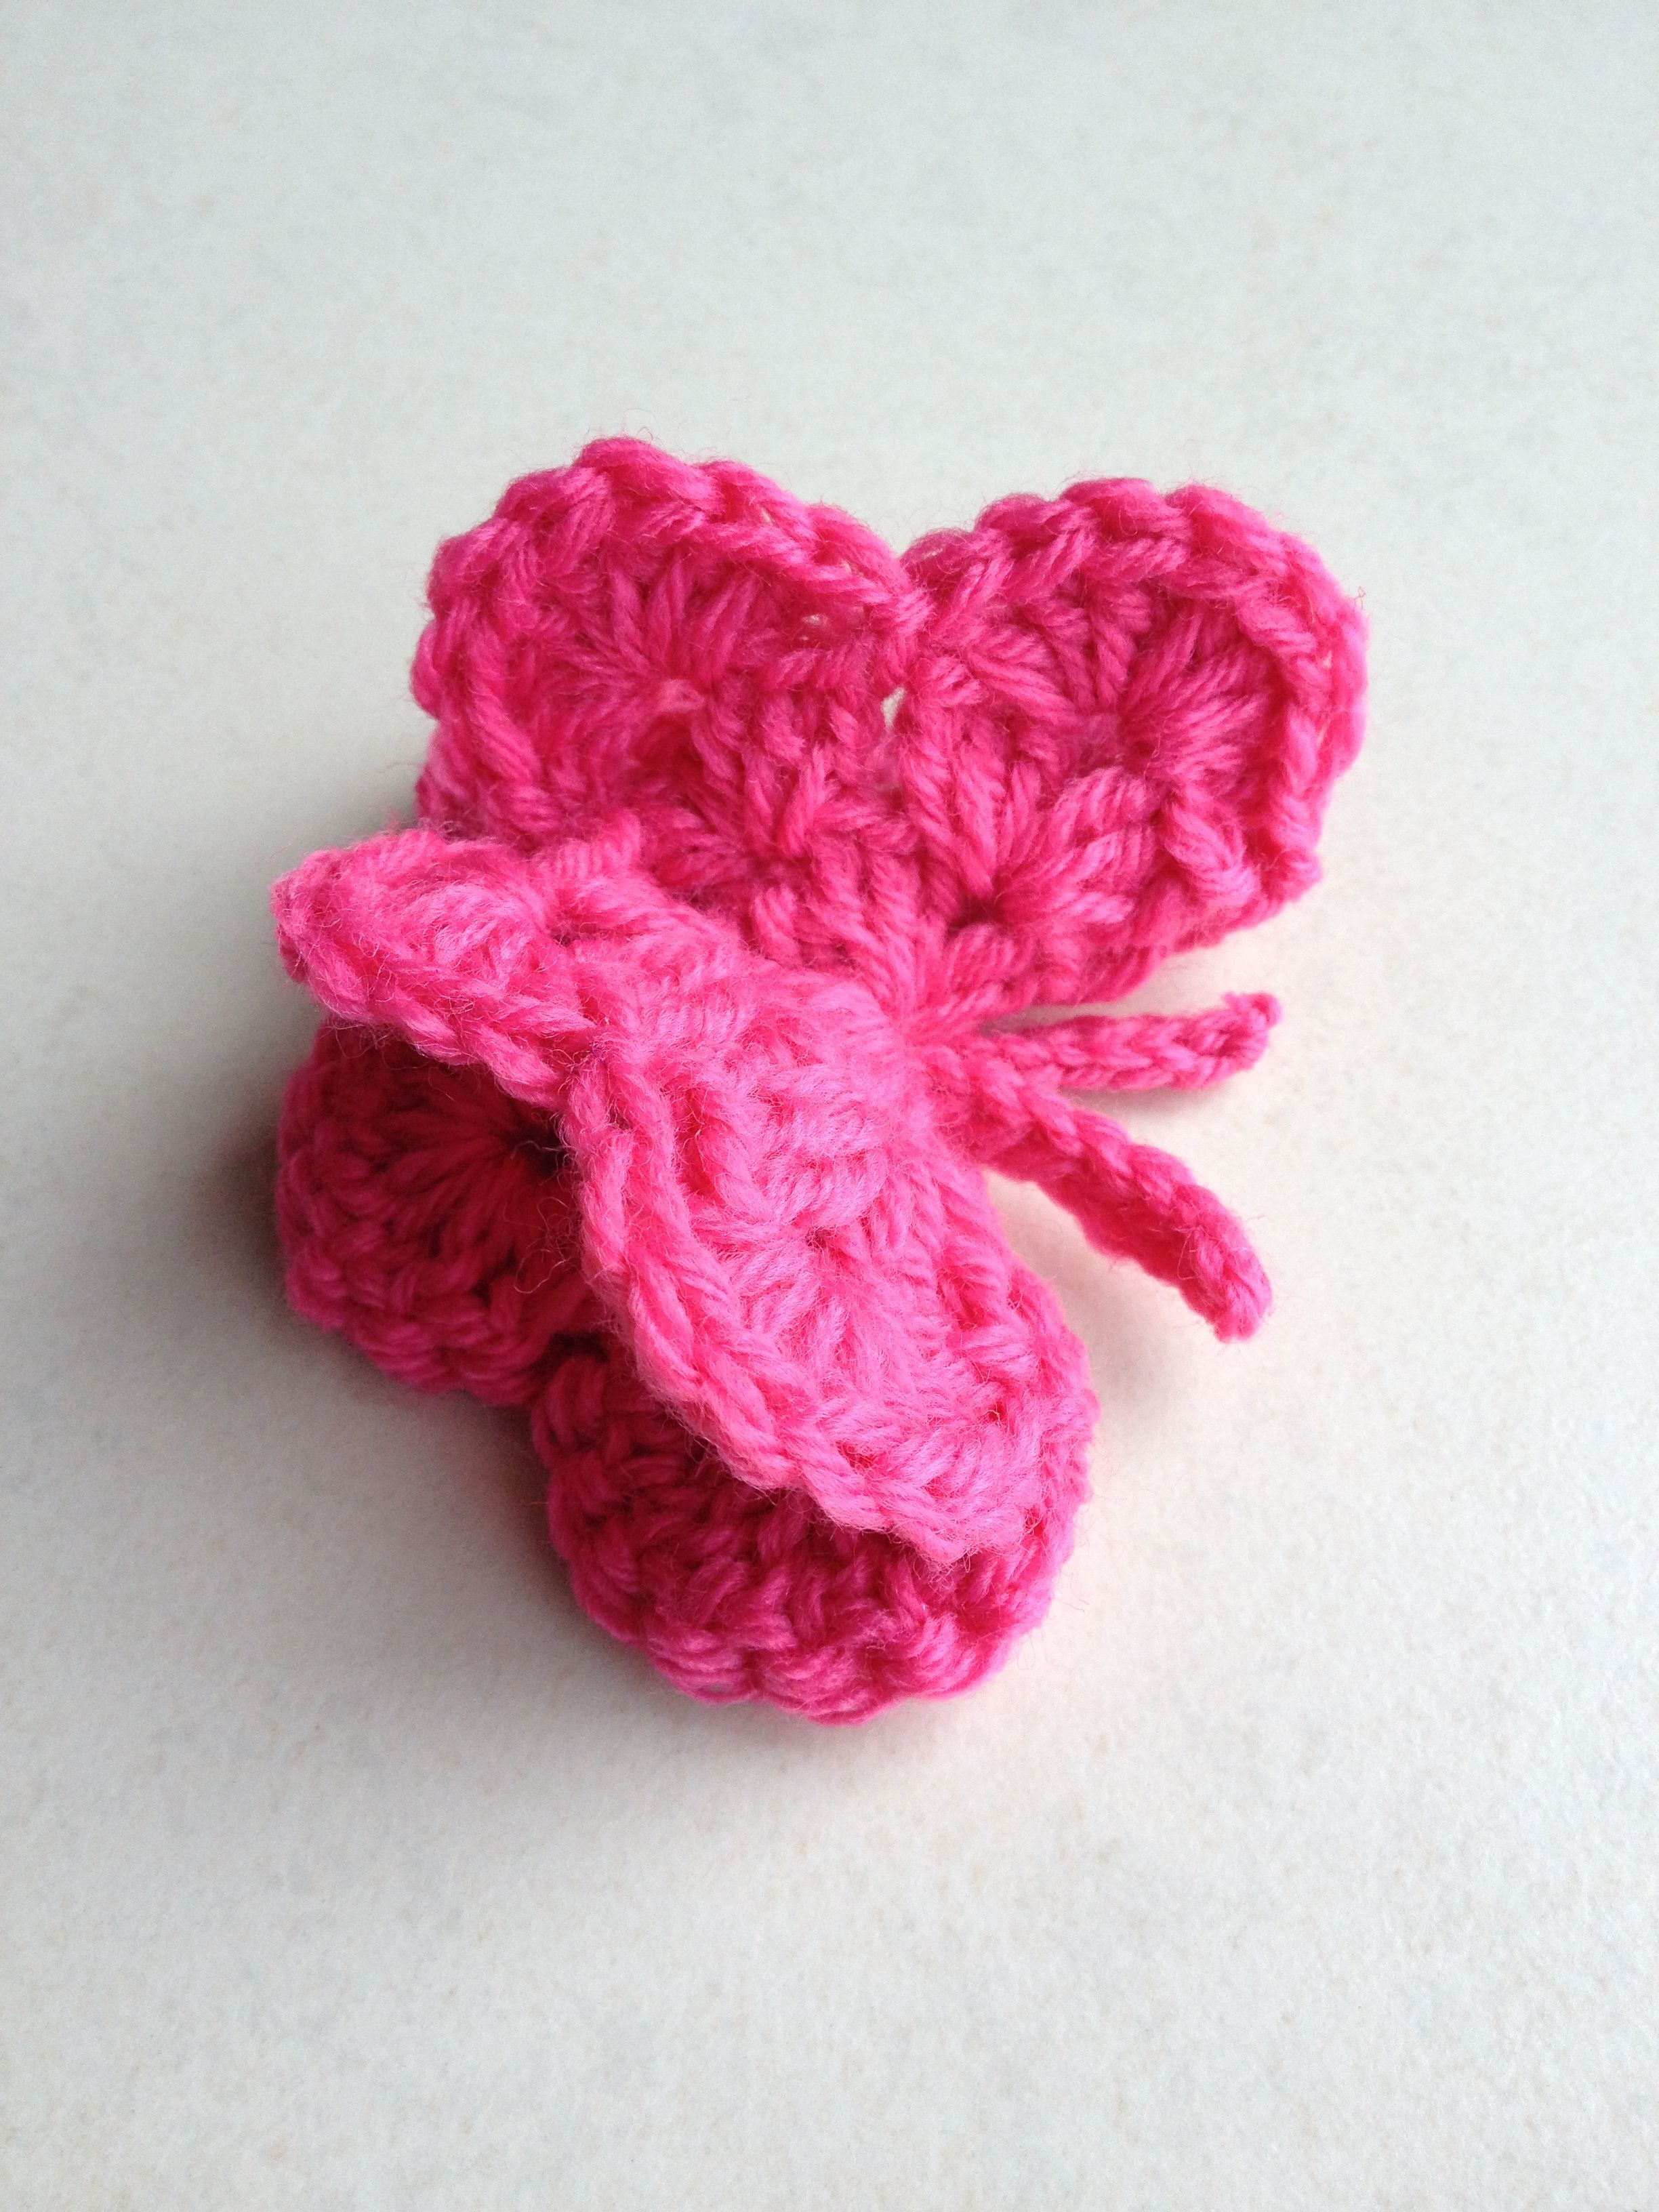 Crochet Butterfly Crafty Inspiration DIY & Crochet Pinterest